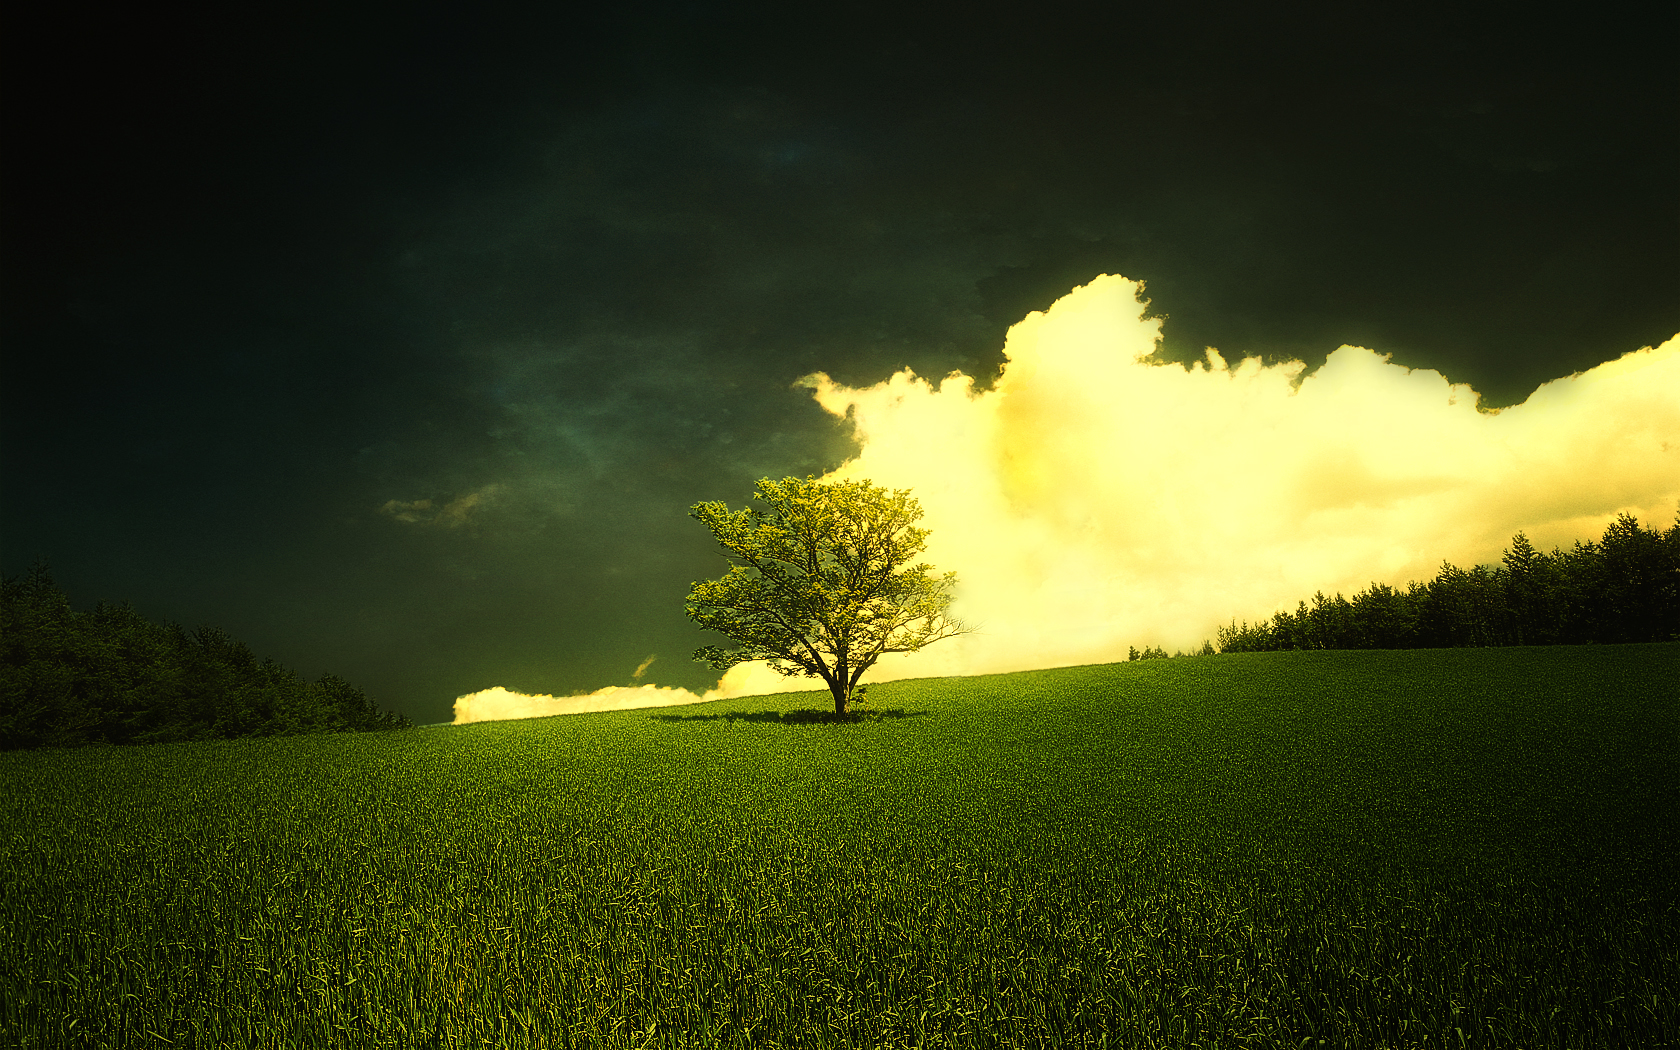 Sfondi hd natura paesaggio bucolico sfondi hd gratis for Sfondi hd gratis